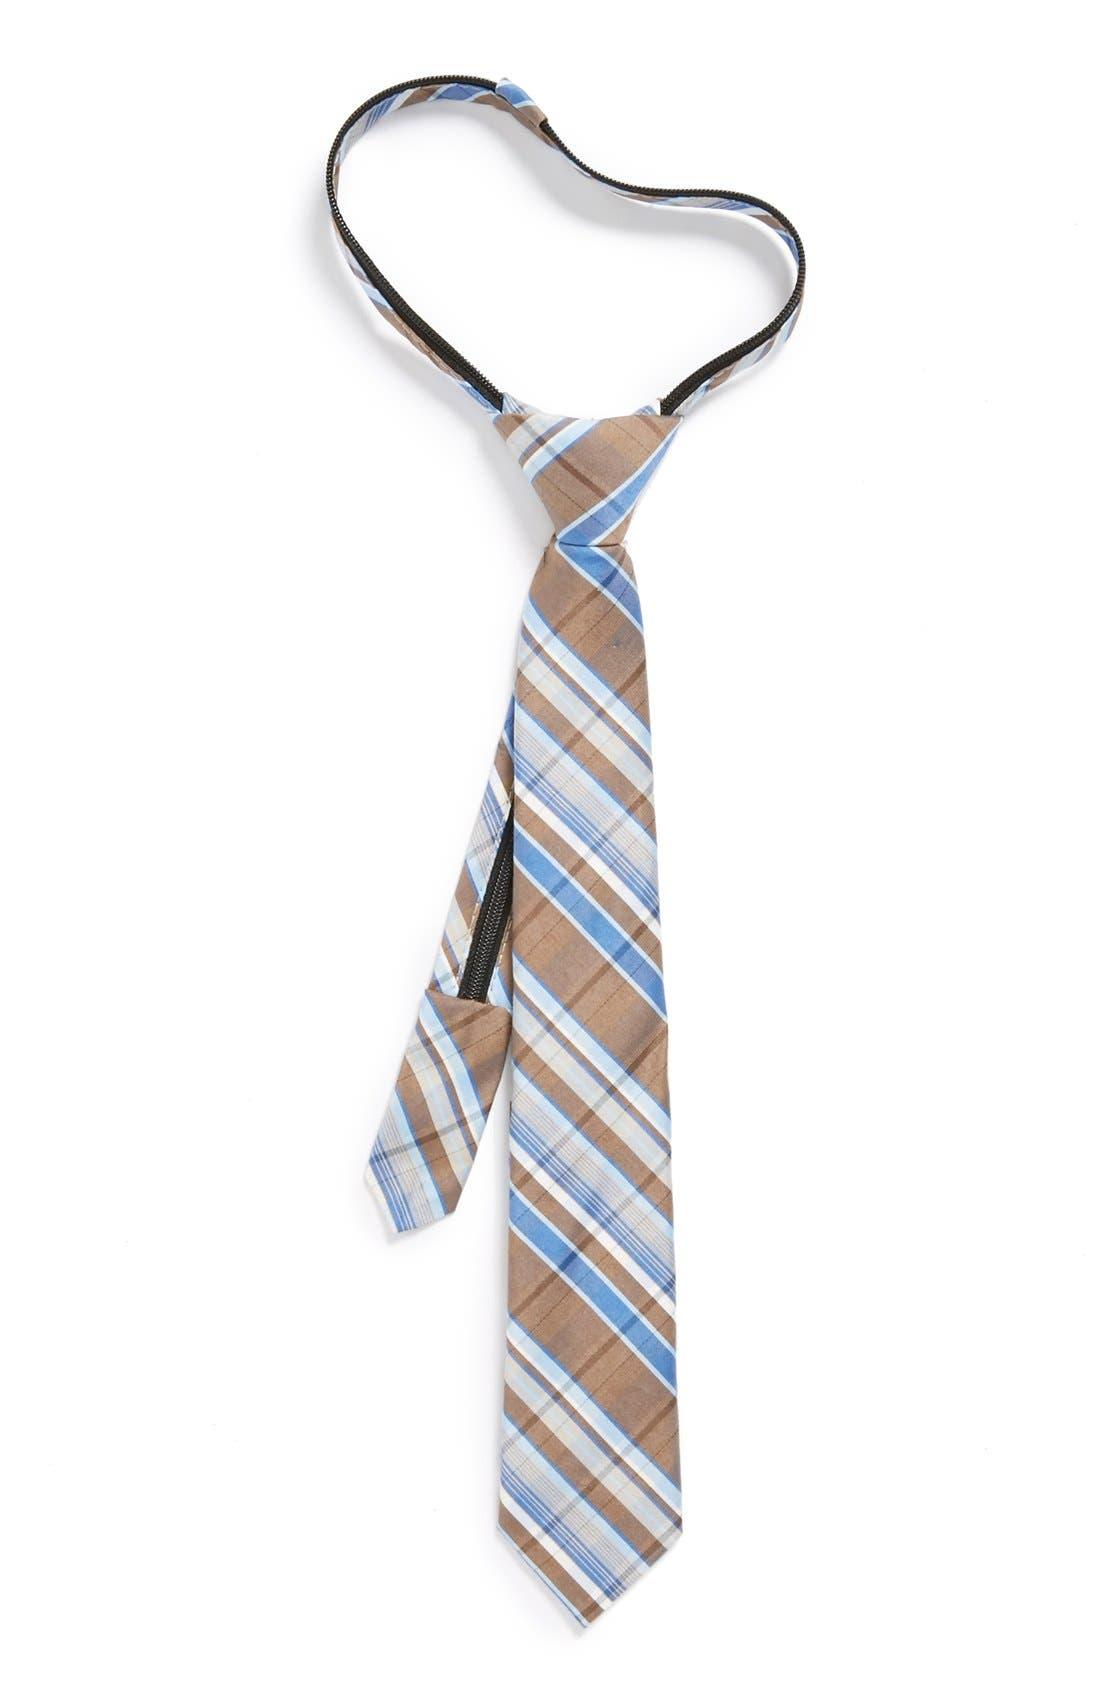 Main Image - Nordstrom Cotton Blend Zipper Tie (Little Boys)